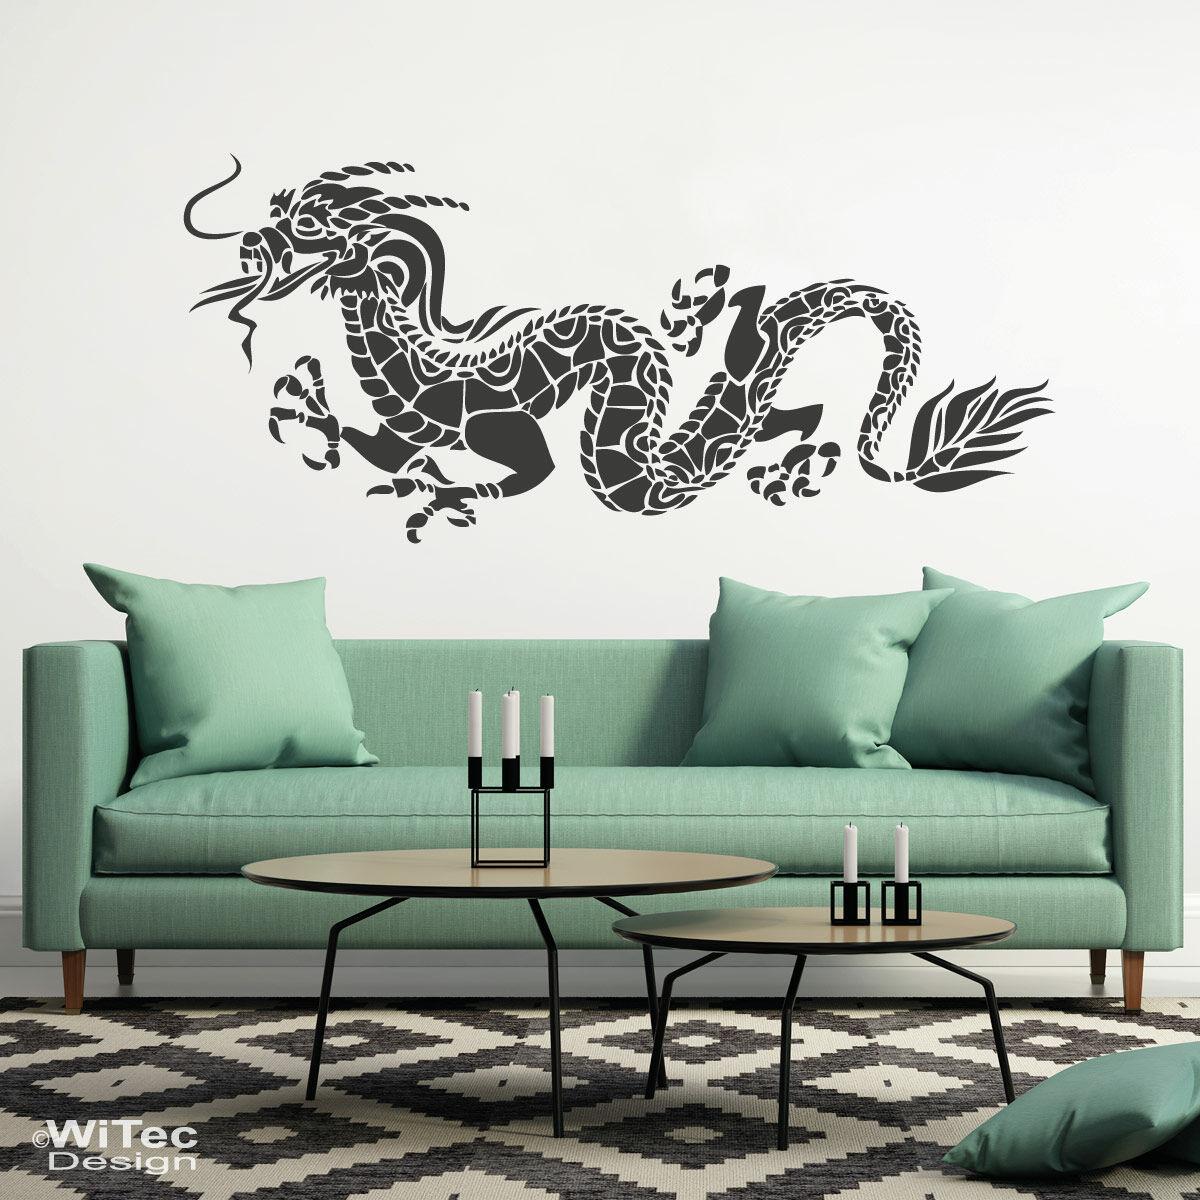 wandaufkleber drache aufkleber wandtattoo. Black Bedroom Furniture Sets. Home Design Ideas